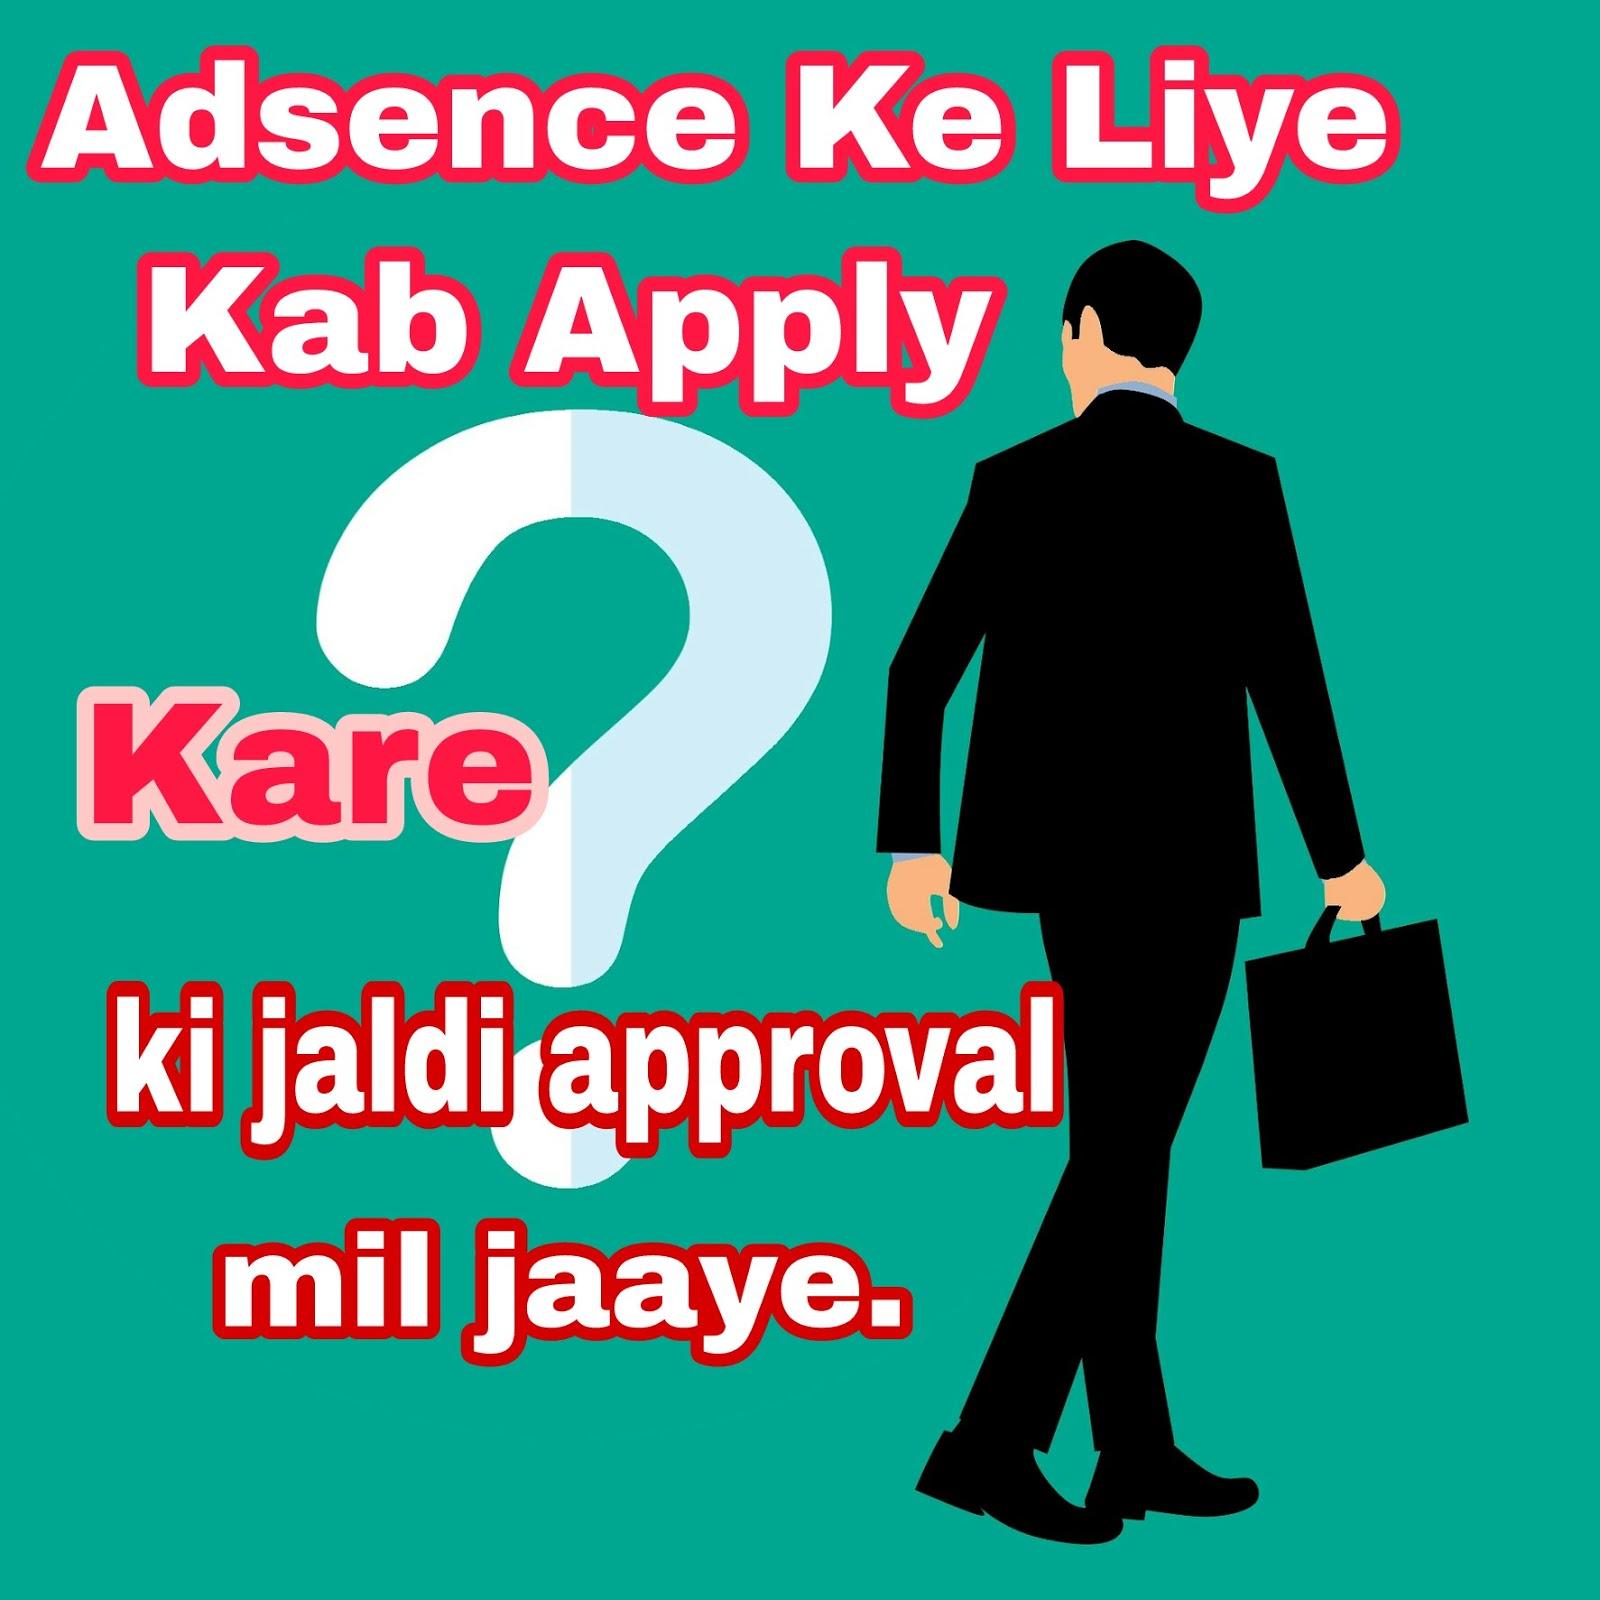 Adsense Ke Liye Kab Apply Kare Ki Jaldi Approval Mil Jaaye